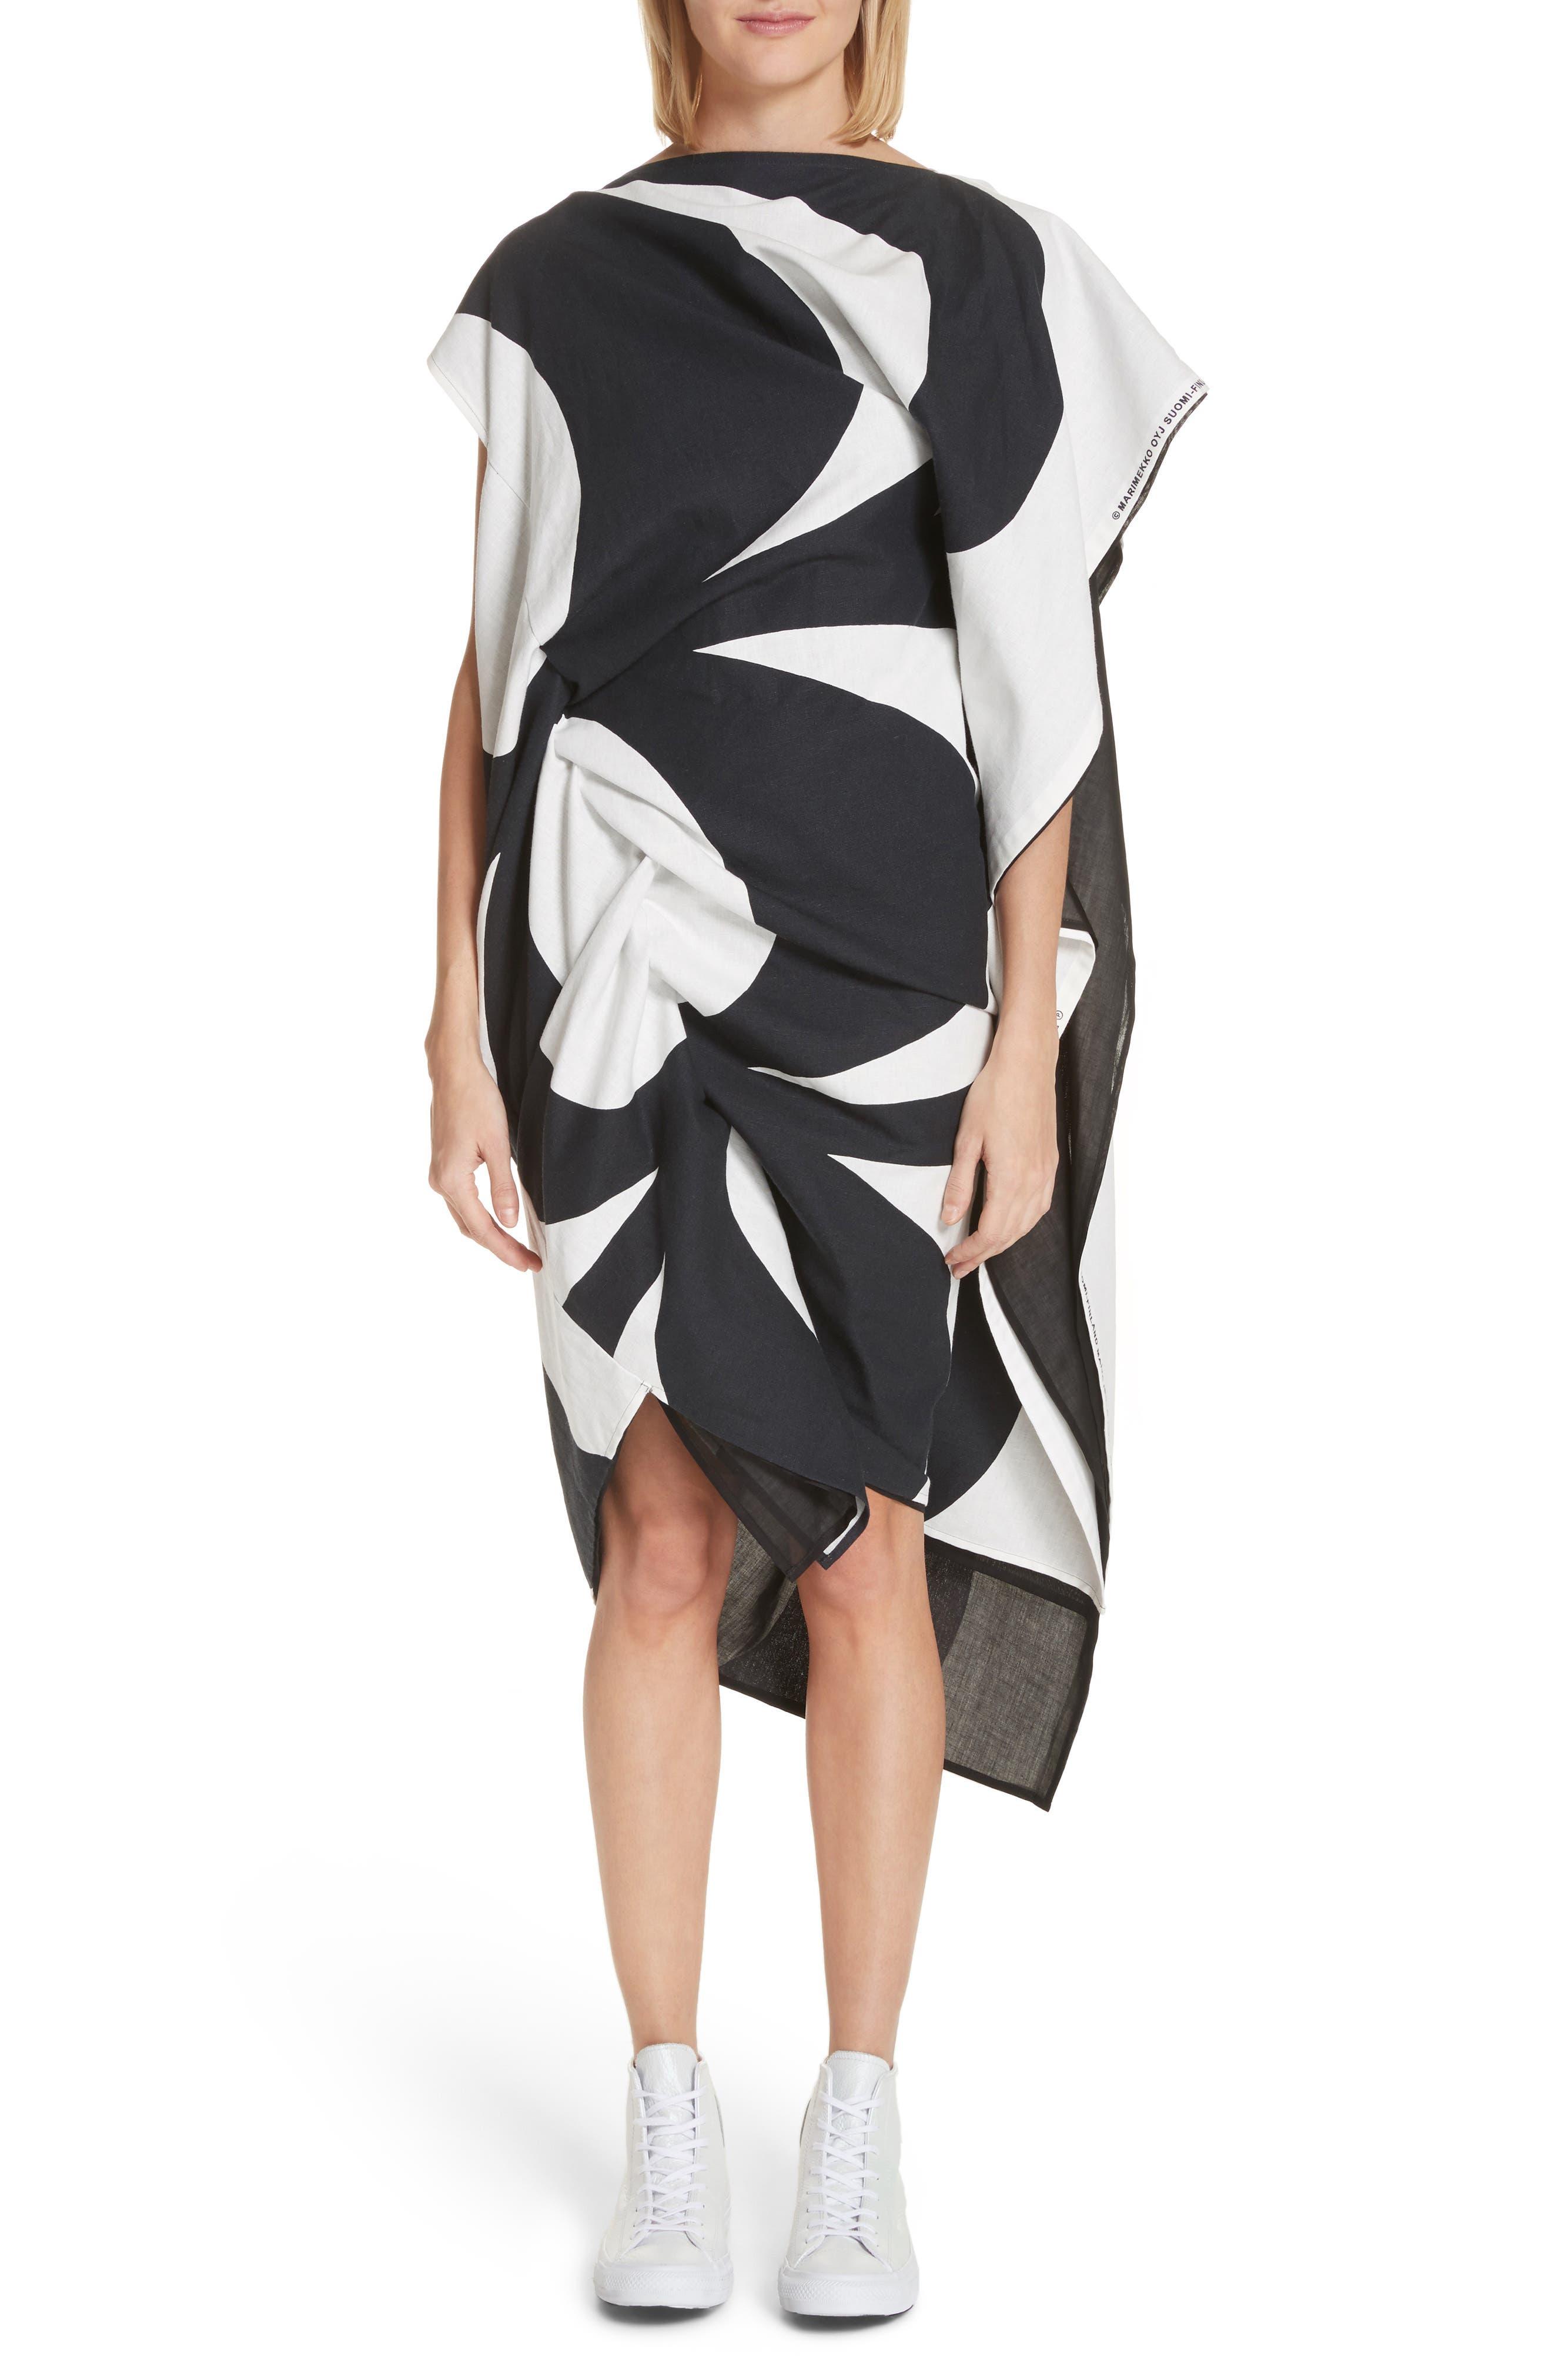 Circular Print Asymmetrical Draped Dress,                         Main,                         color, Wht/ Blk X Blk